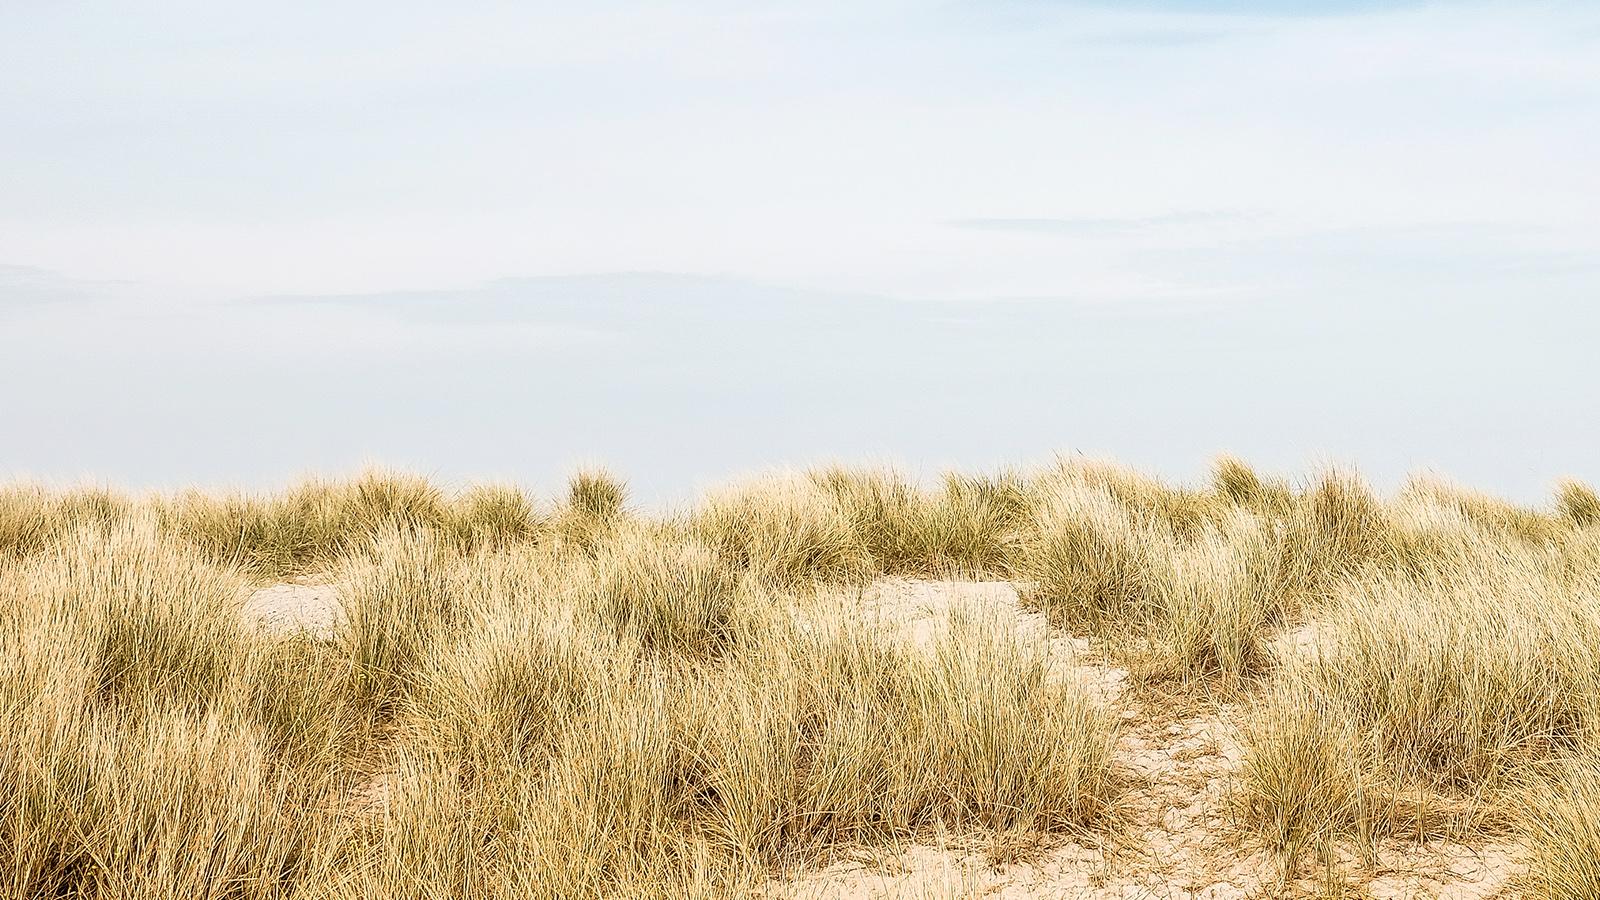 dune-4.17.19.jpg